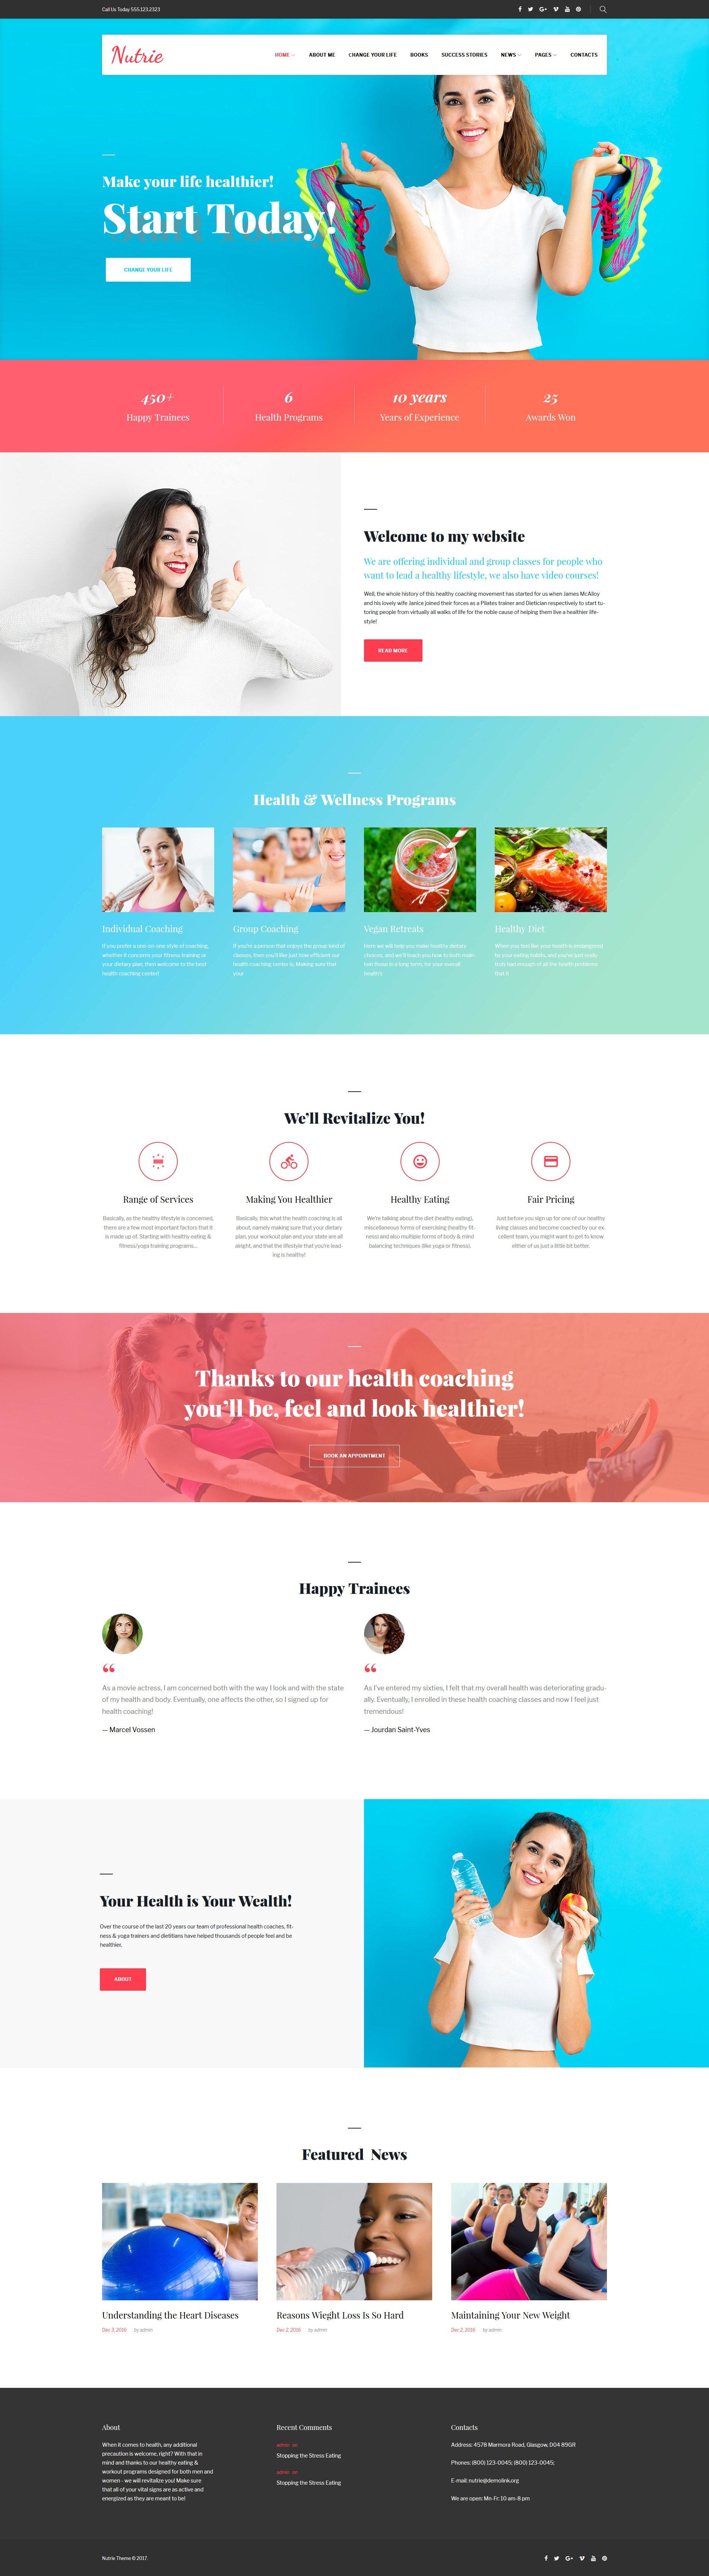 "WordPress Theme namens ""Nutrie - Gesundheitscoach"" #63524 - Screenshot"